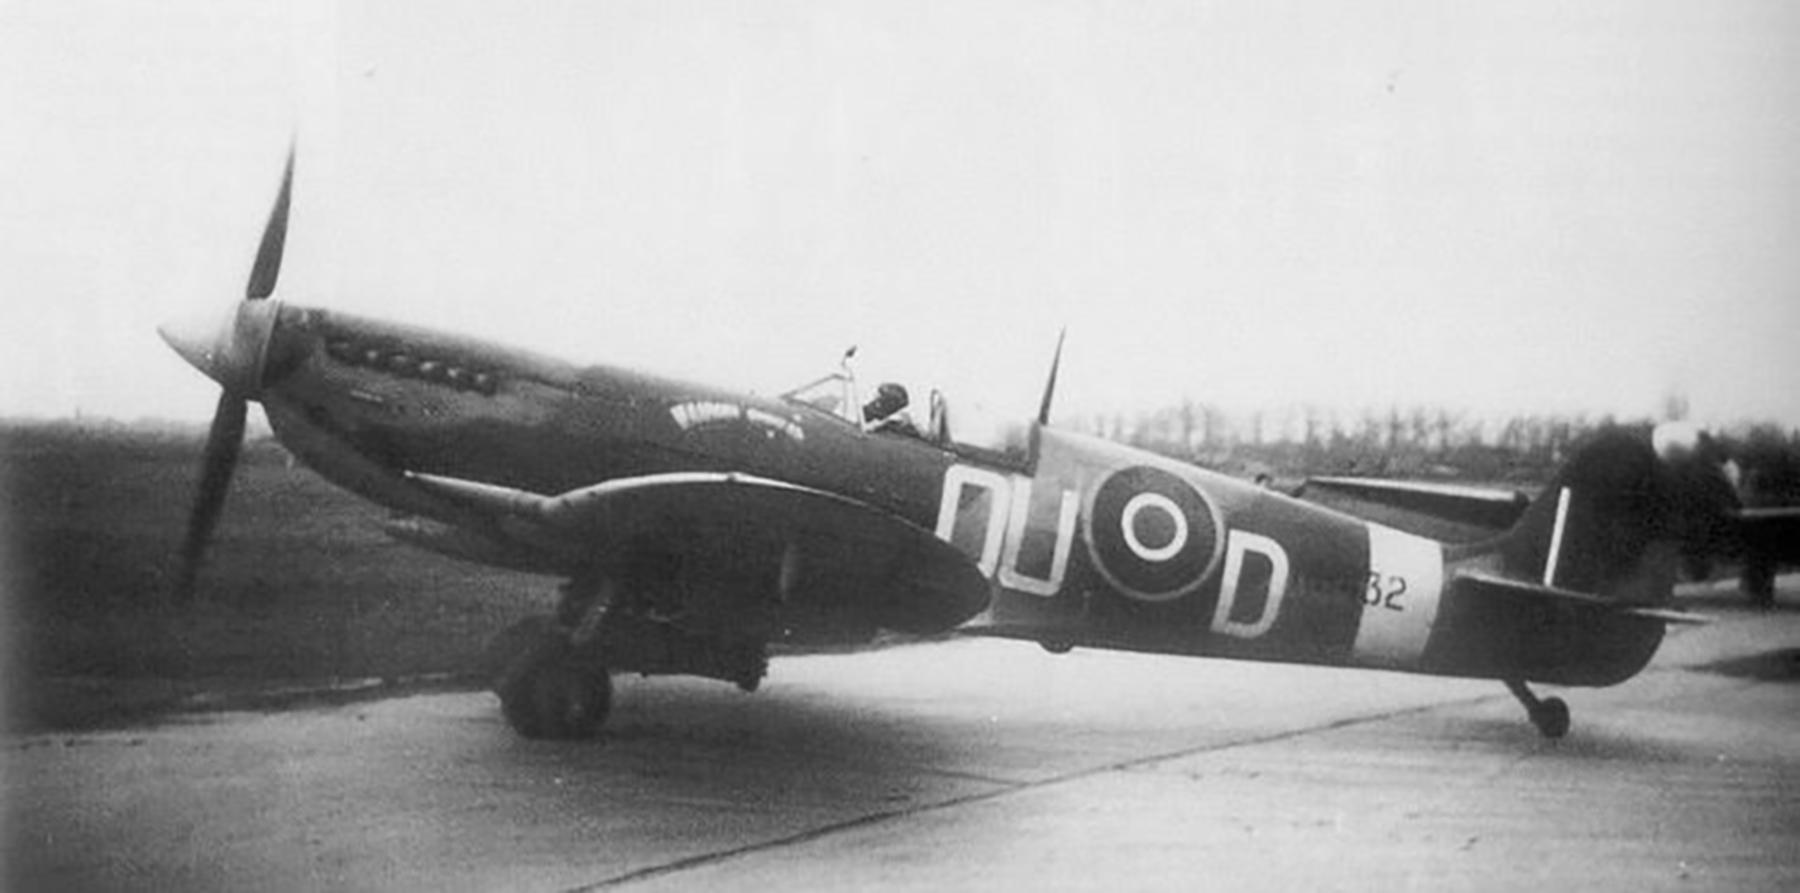 Spitfire LFIXe RNZAF 485Sqn OUD Max Collett MH432 England 01